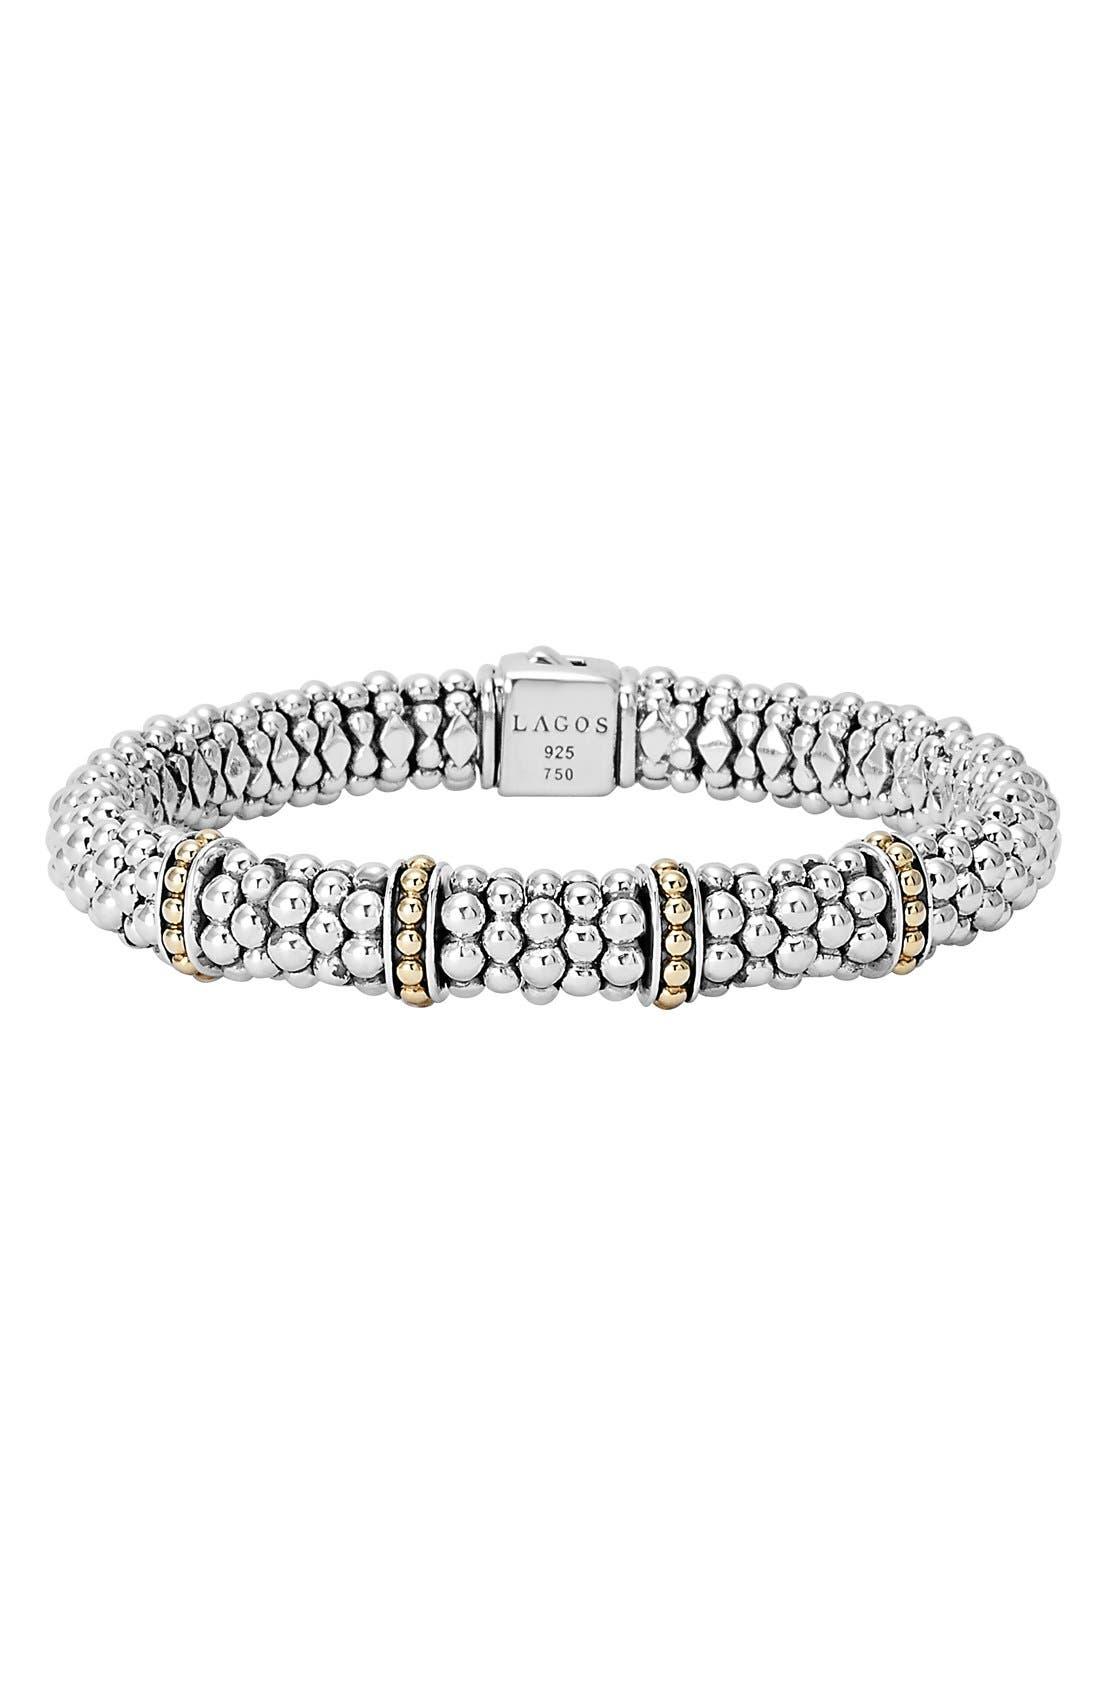 LAGOS 'Enso' Two-Tone Rope Caviar™ Bracelet